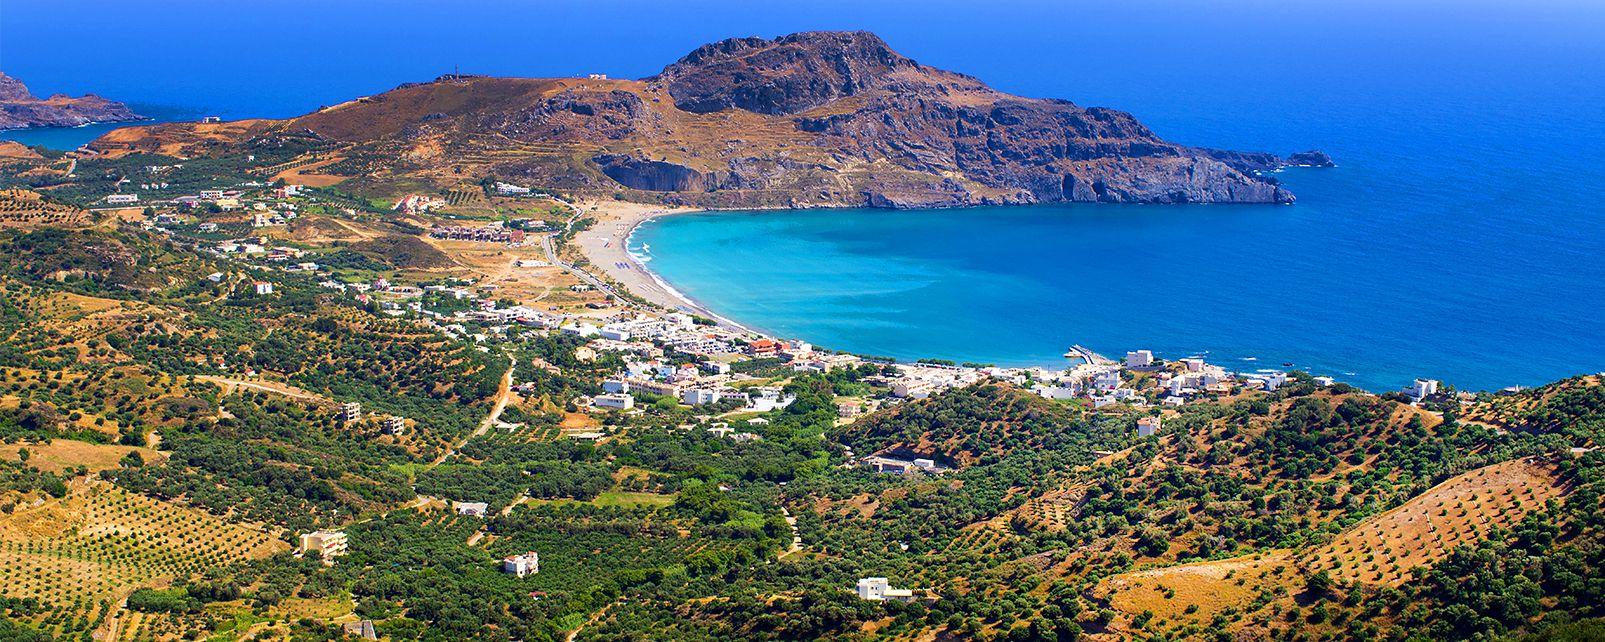 The south coast, Coasts, Crete